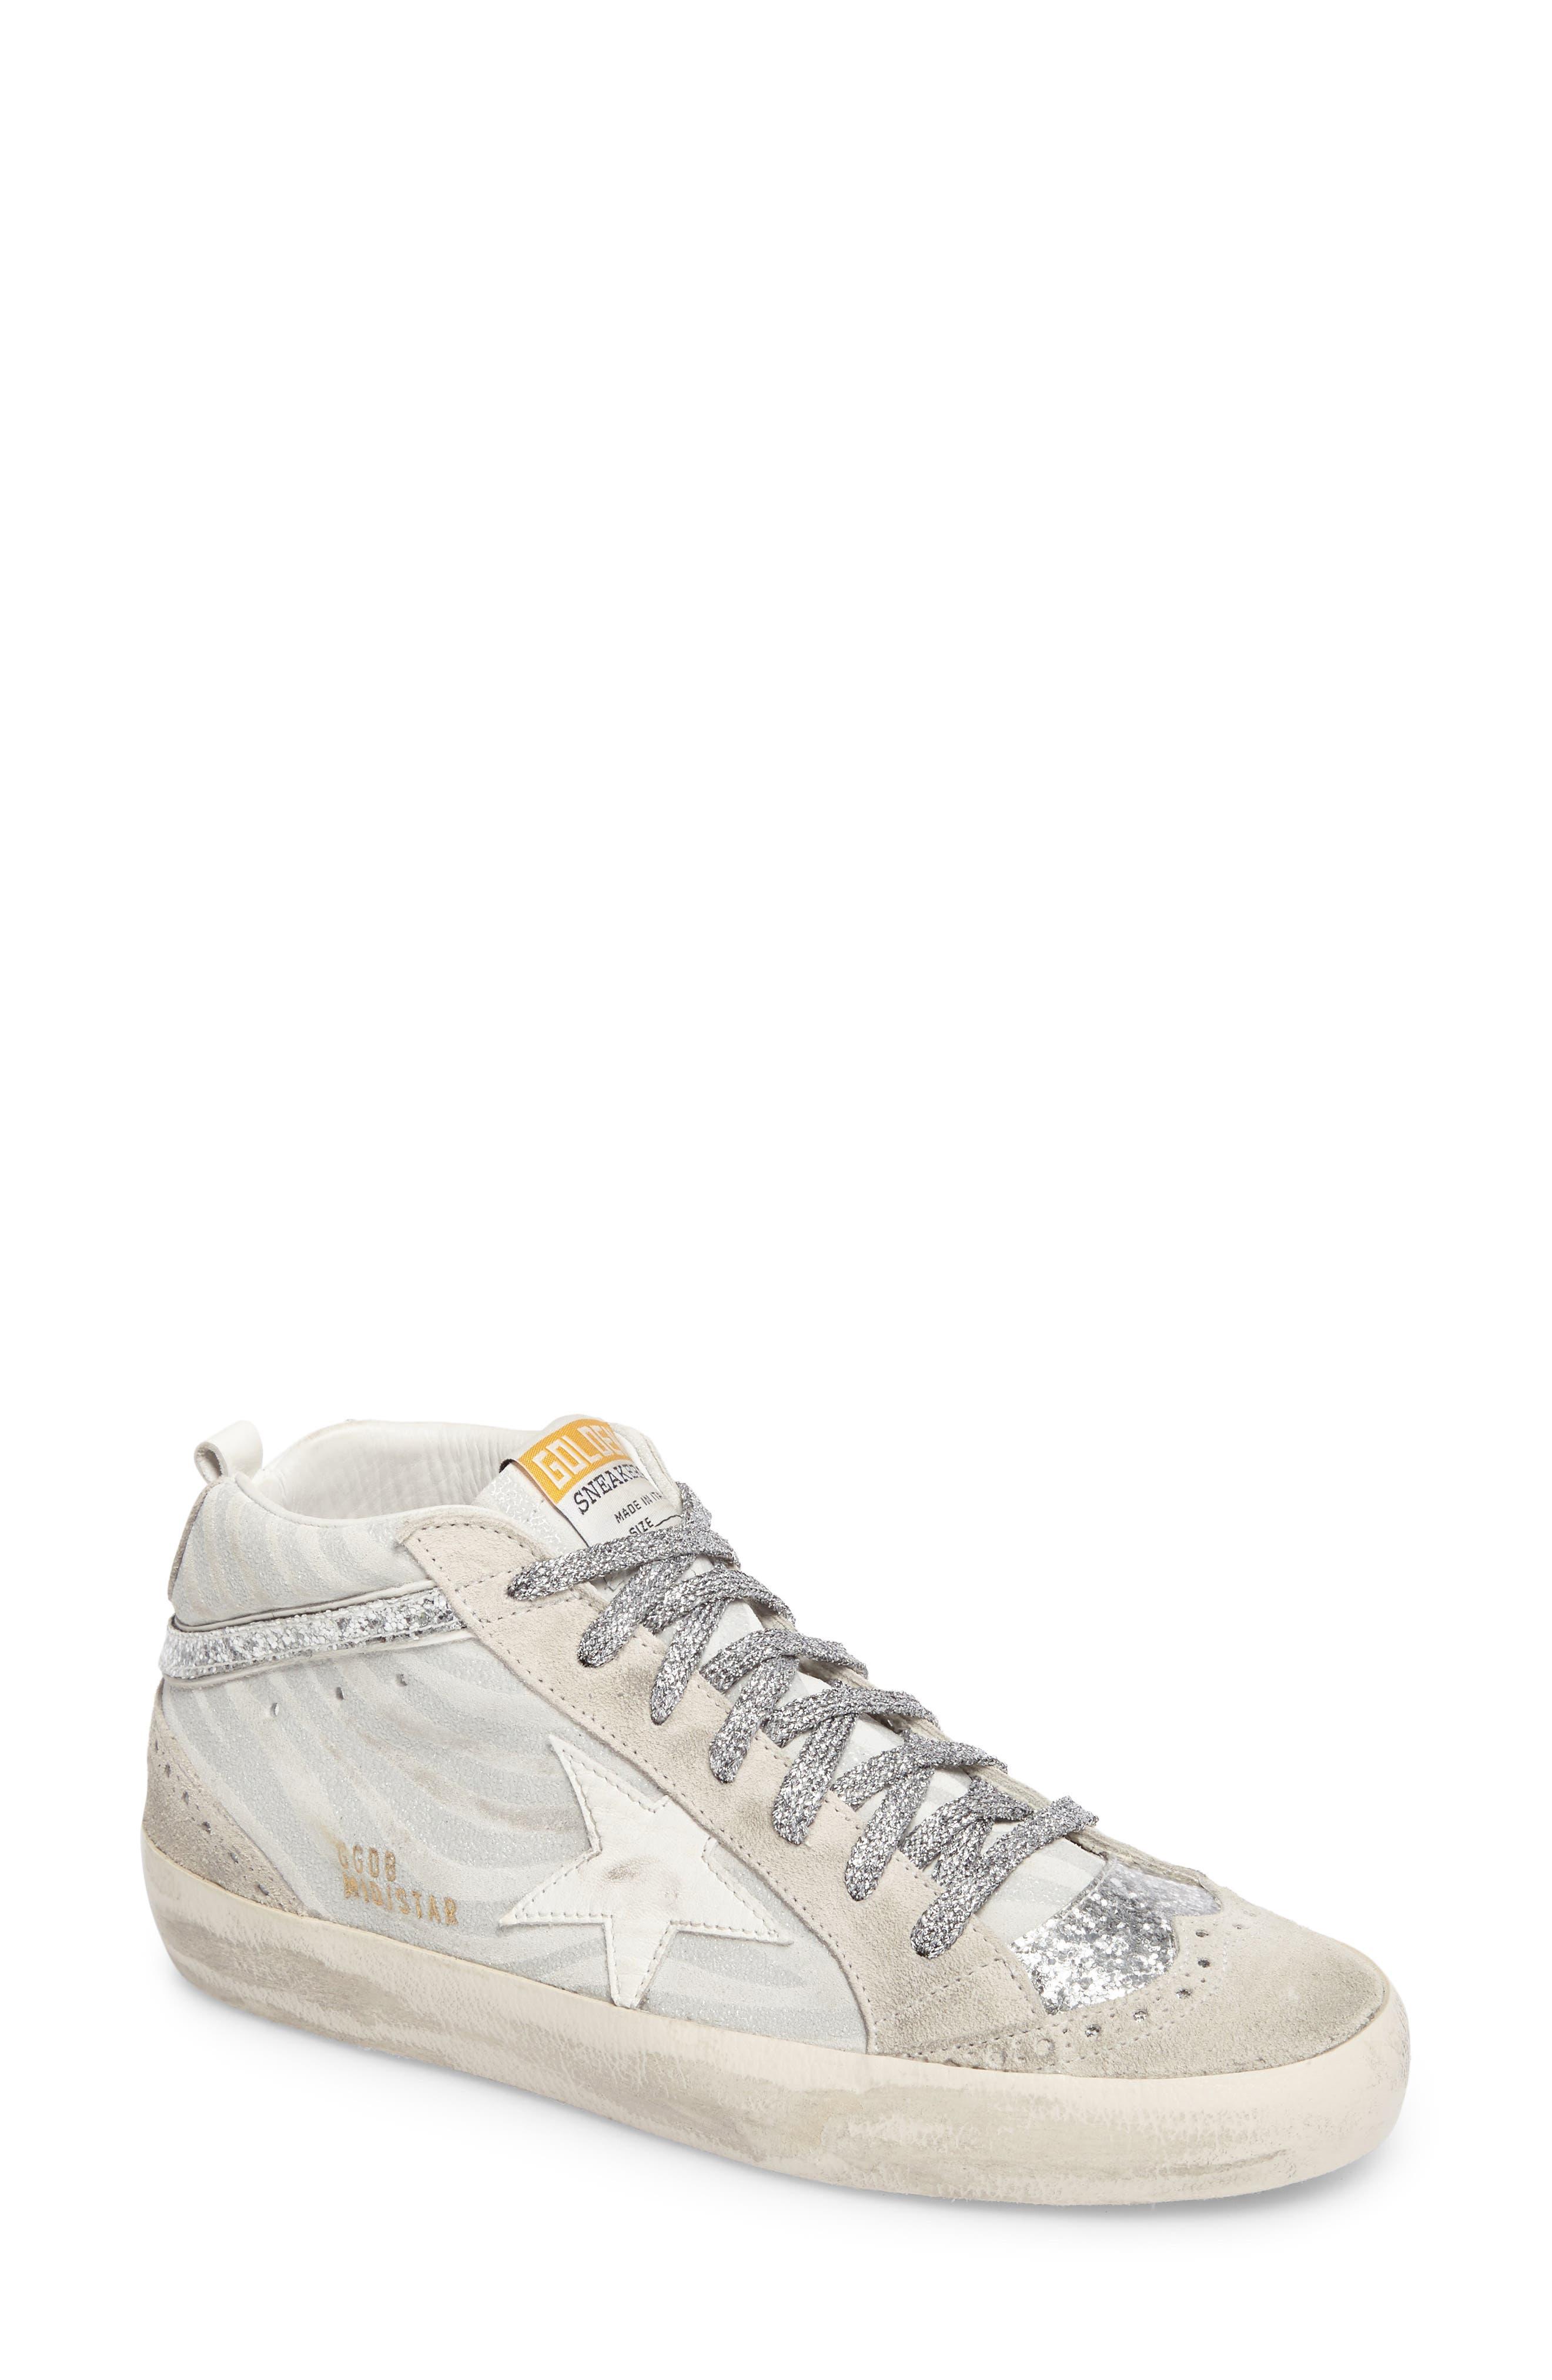 Star Mid Top Sneaker,                         Main,                         color, White Zebra